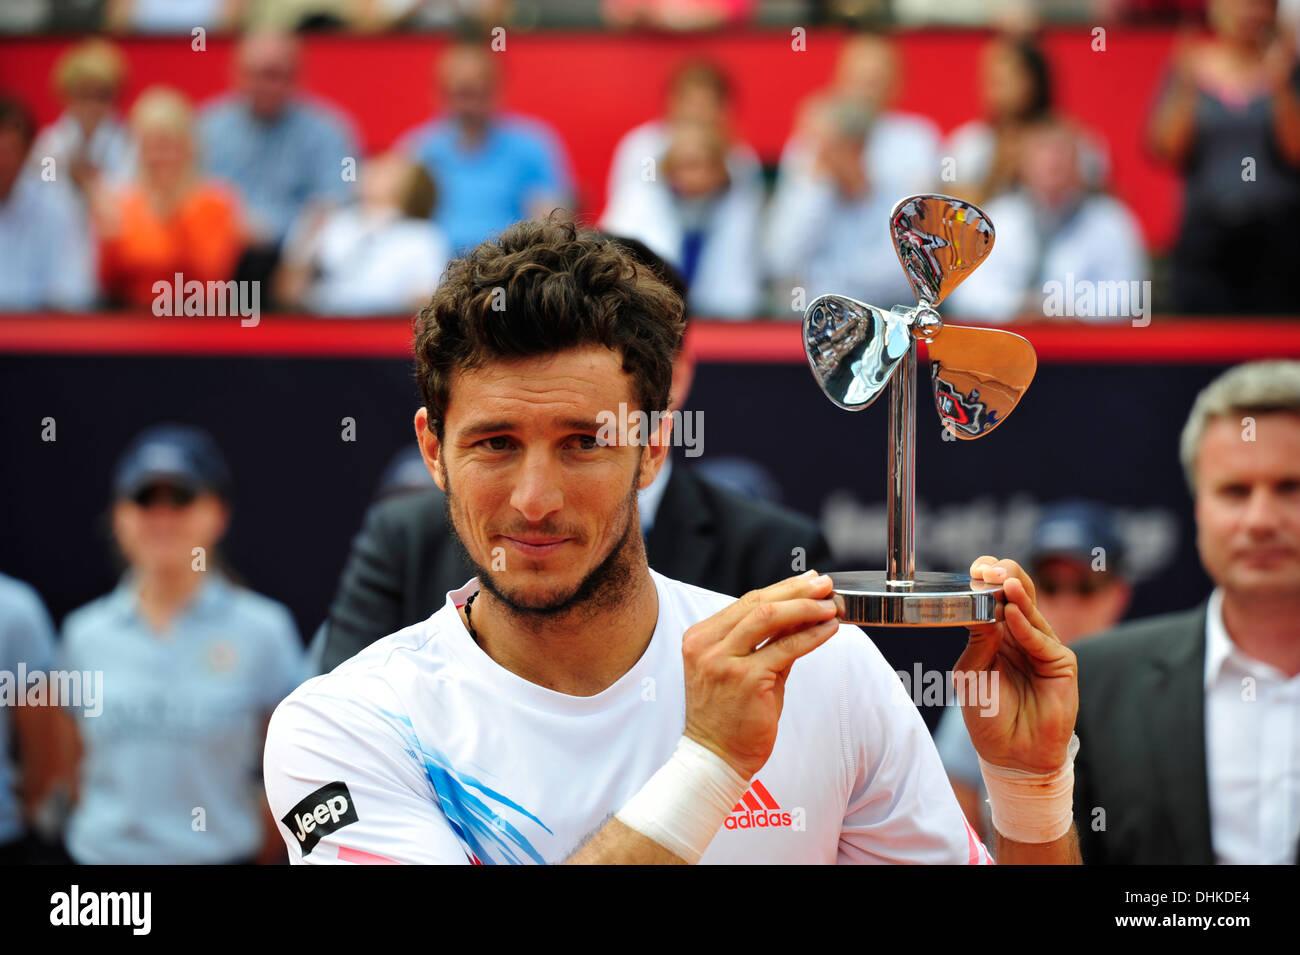 Juan Monaco (ARG), winner of bet-at-home Tennis Match 2012, Rothenbaum, Hamburg, Germany. Press use only. - Stock Image